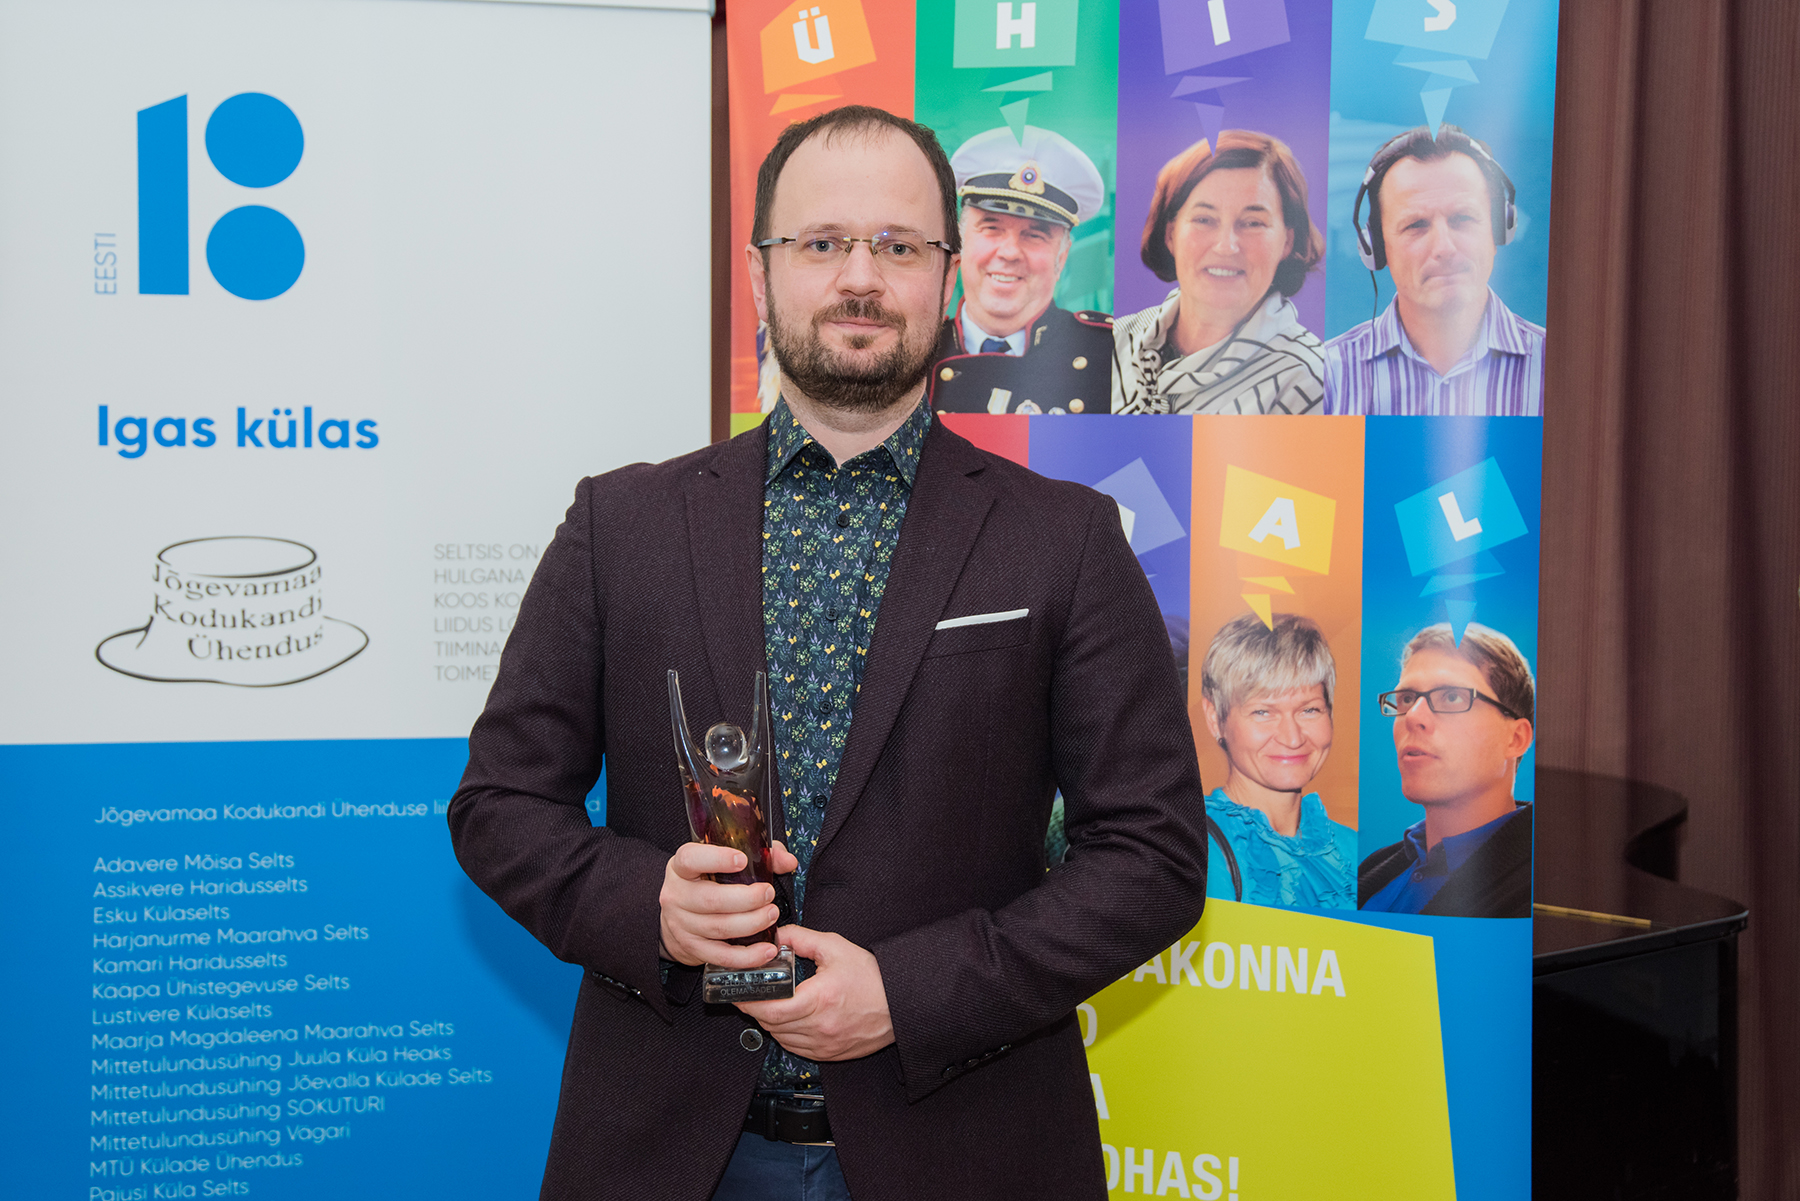 Hannes Soosaar, Jõgevamaa Sädeinimene 2019. Foto Liina Laurikainen